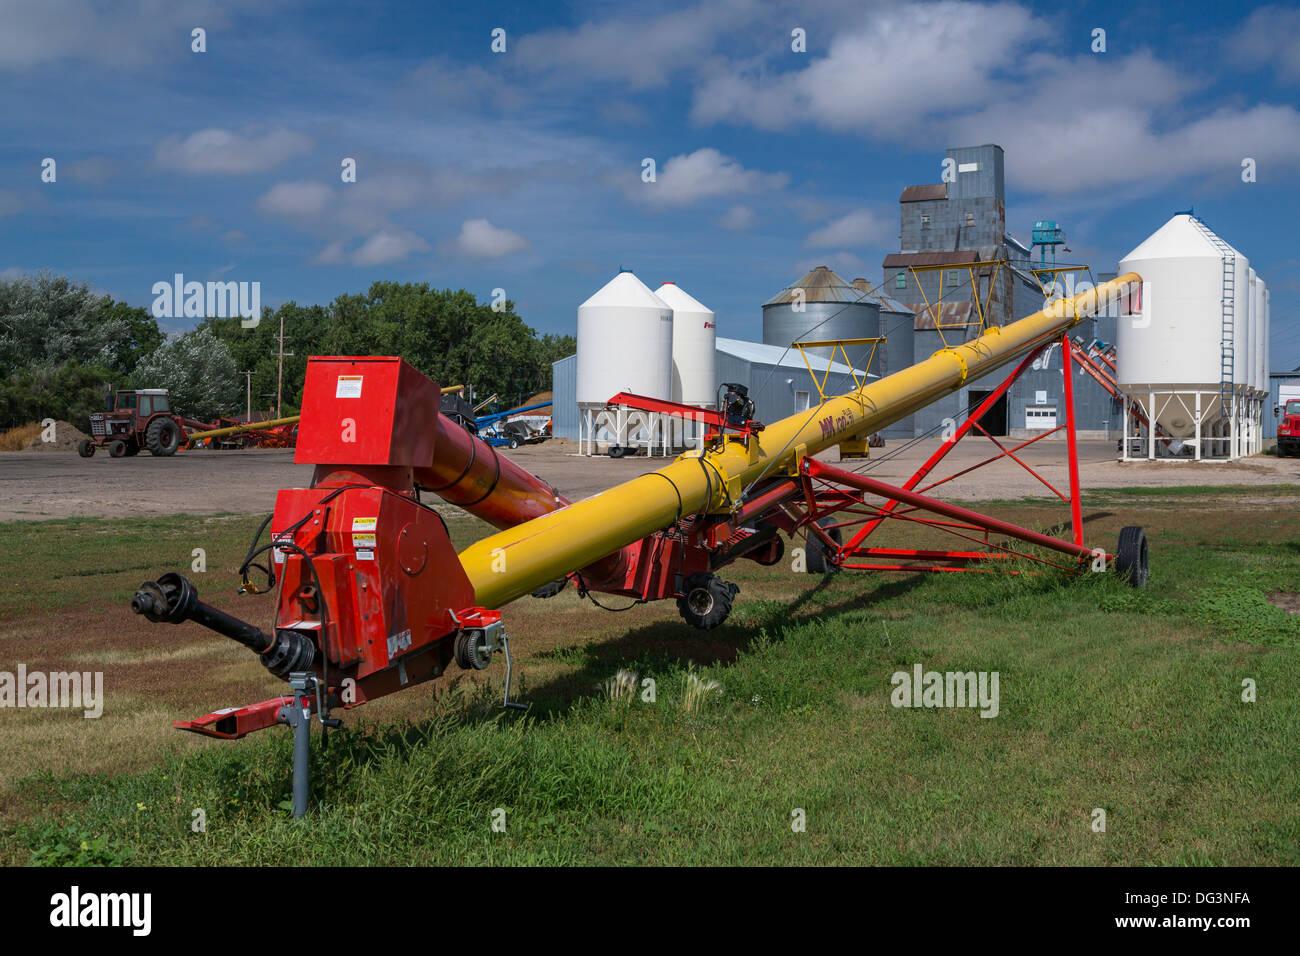 Grain augers and a grain storage facility at Linton, North Dakota, USA. - Stock Image